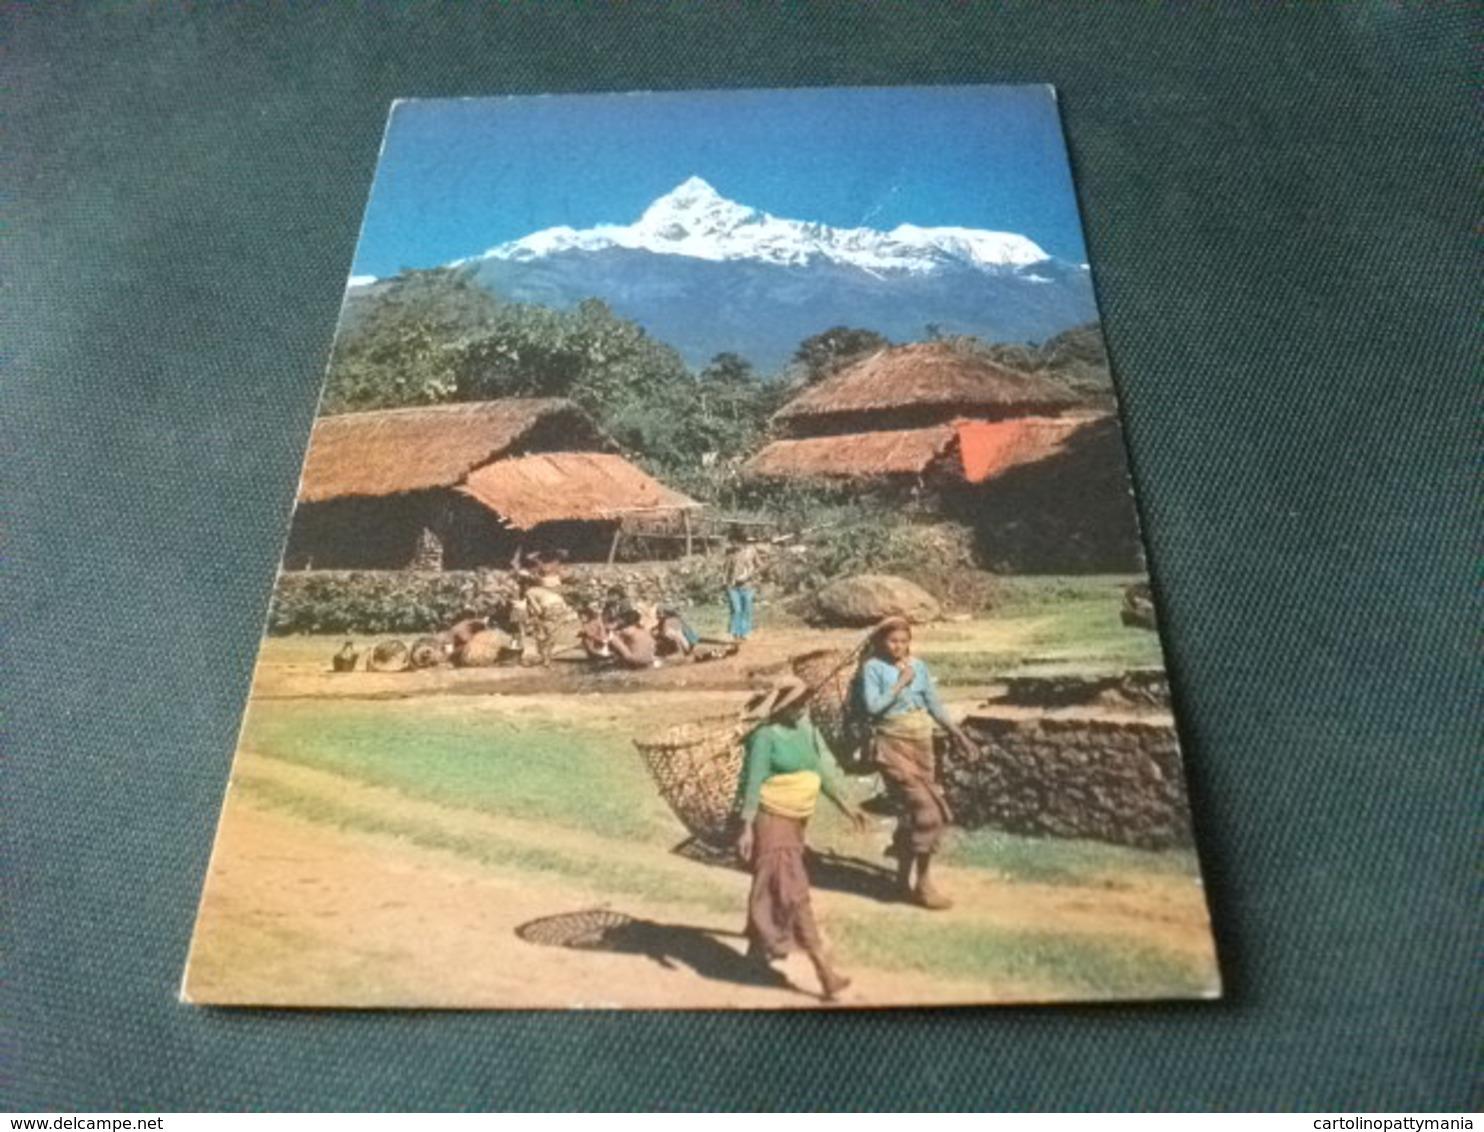 STORIA POSTALE  FRANCOBOLLO  NEPAL BHIM RATNA HARSHA RATNA  NEW HOTEL CRYSTAL POKHARA PIEGHE - Nepal